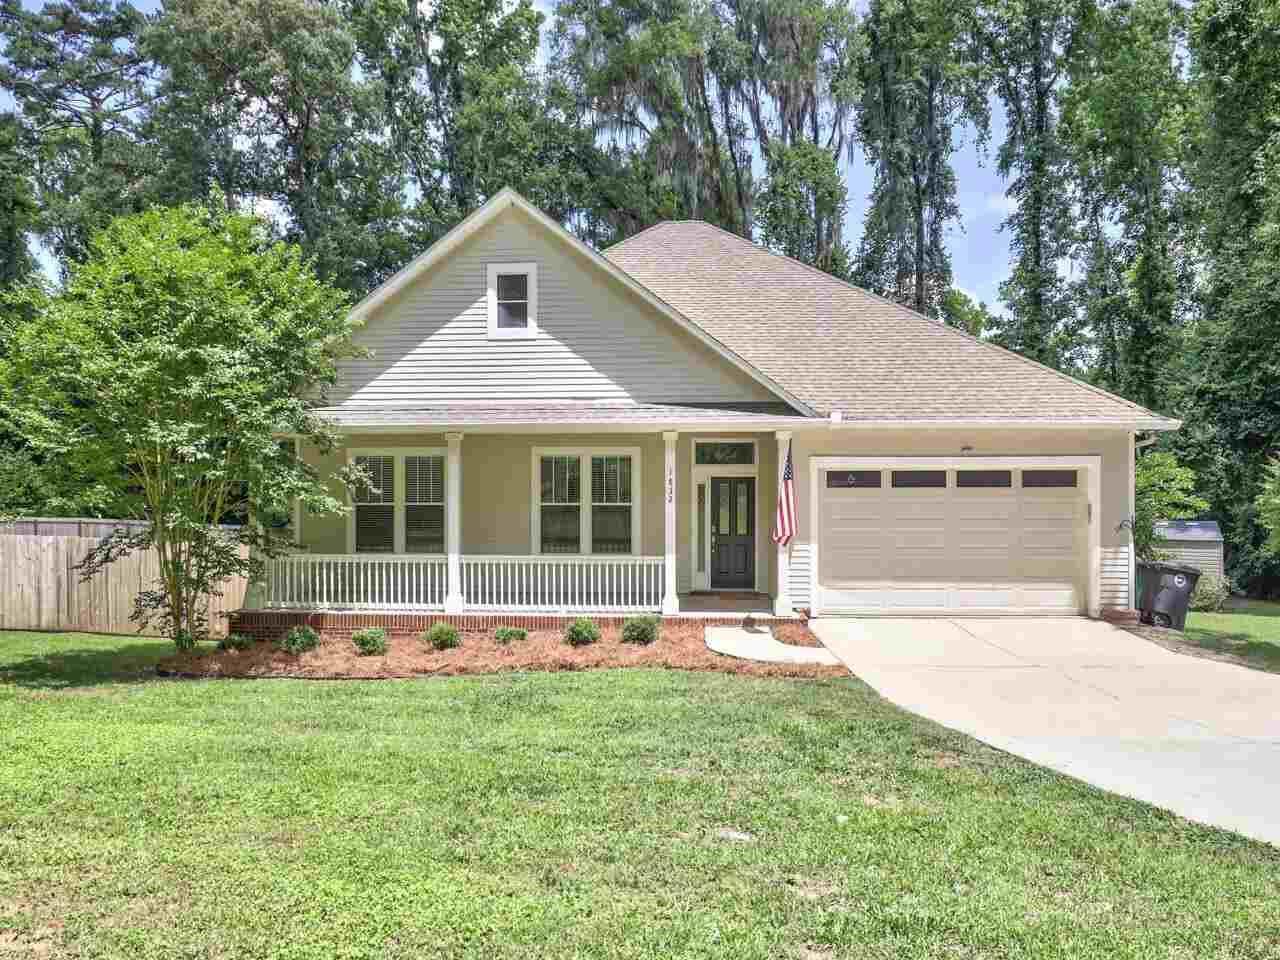 1832 Benado Lomas Drive, Tallahassee, FL 32317 - MLS#: 335090